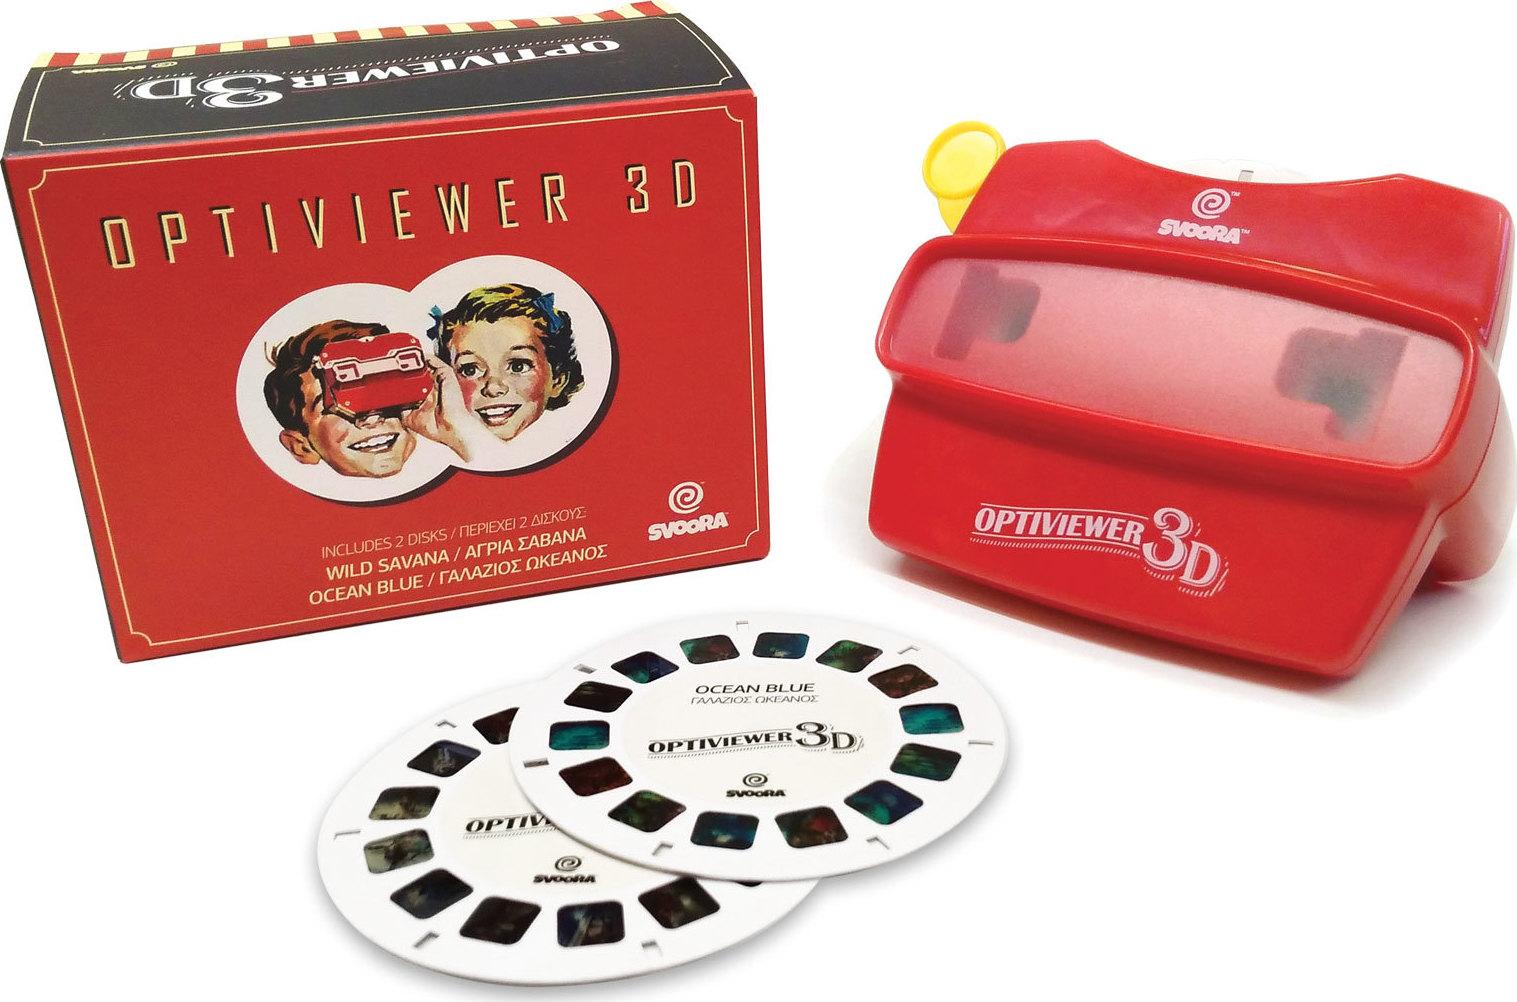 Svoora 3D Optiviewer με 2 Κάρτες